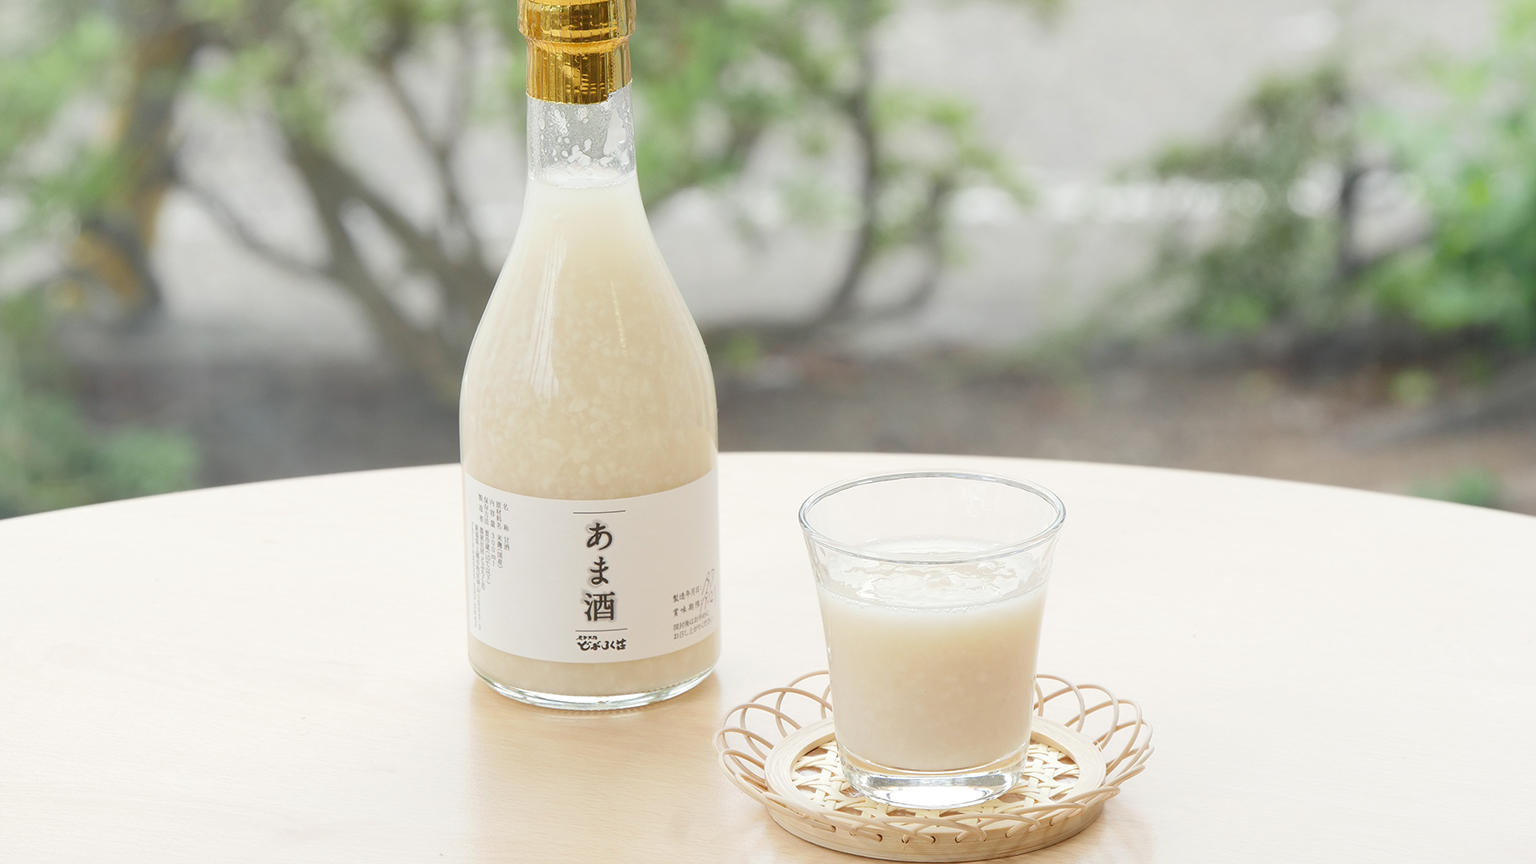 P甘酒2-2